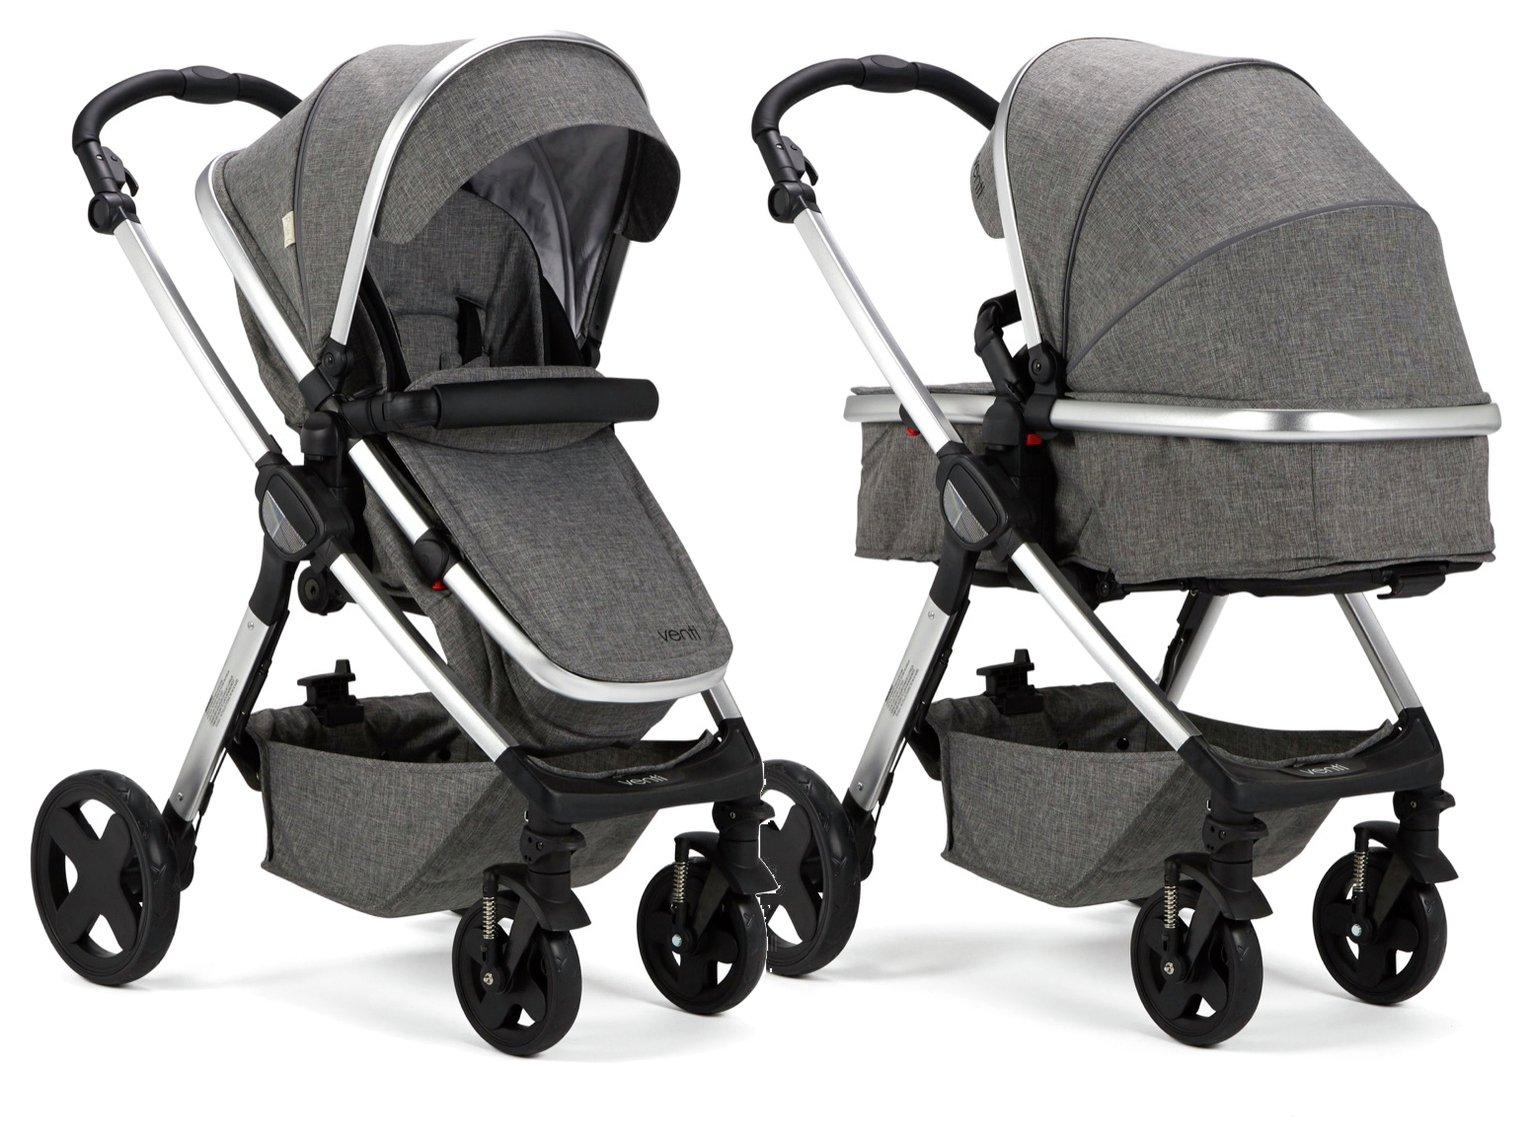 Baby Elegance Venti 2-in-1 Pushchair by Rosie - Grey